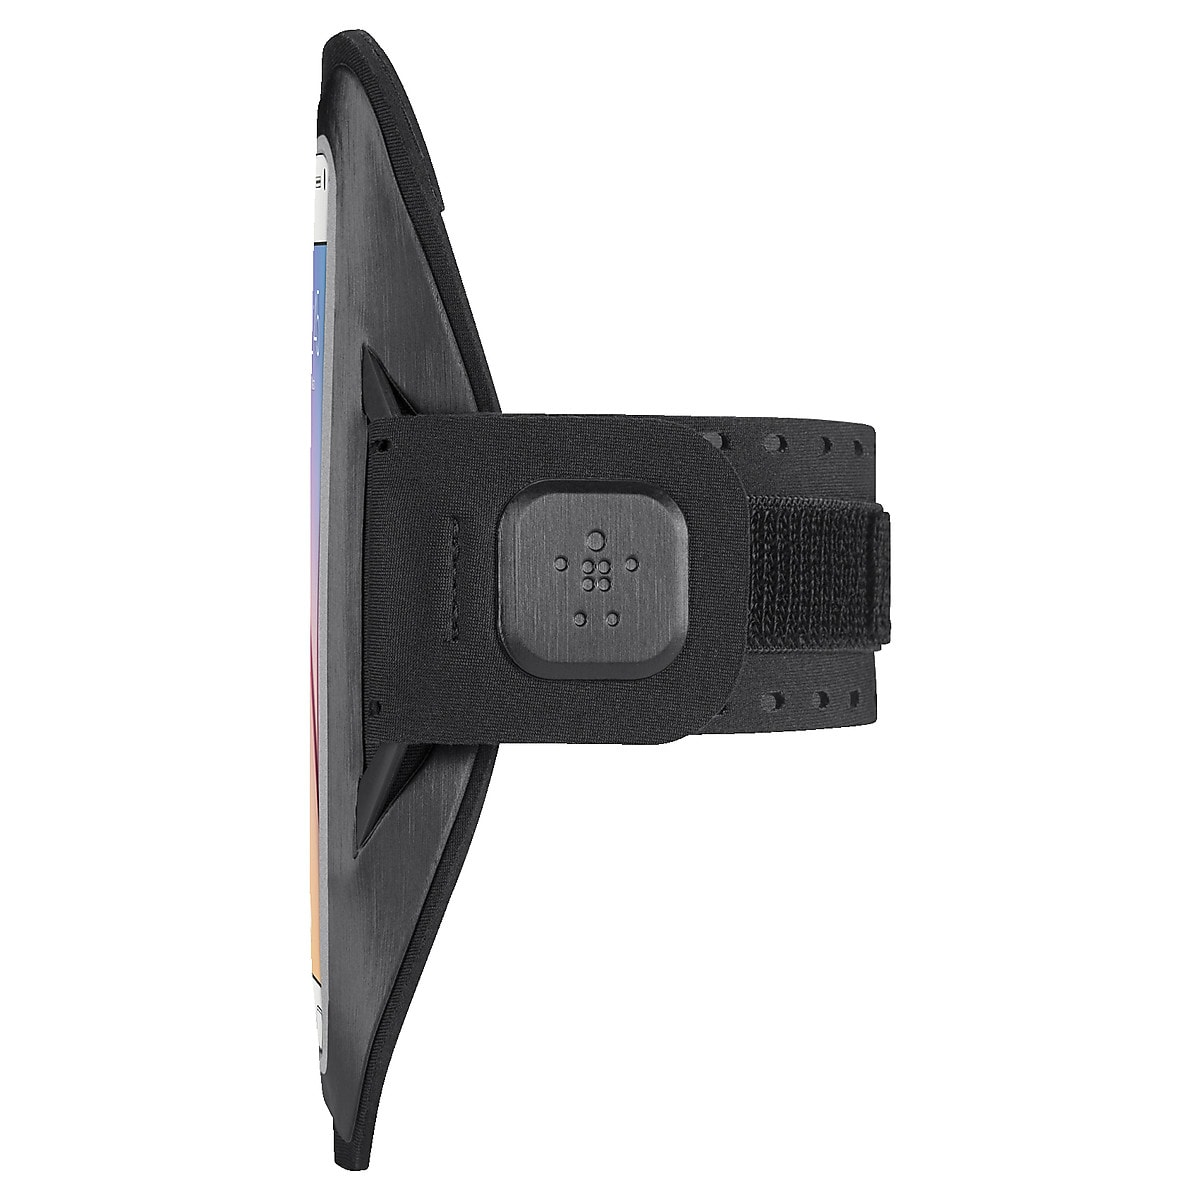 Sportarmband für Samsung Galaxy S7 Belkin Slim Fit Plus